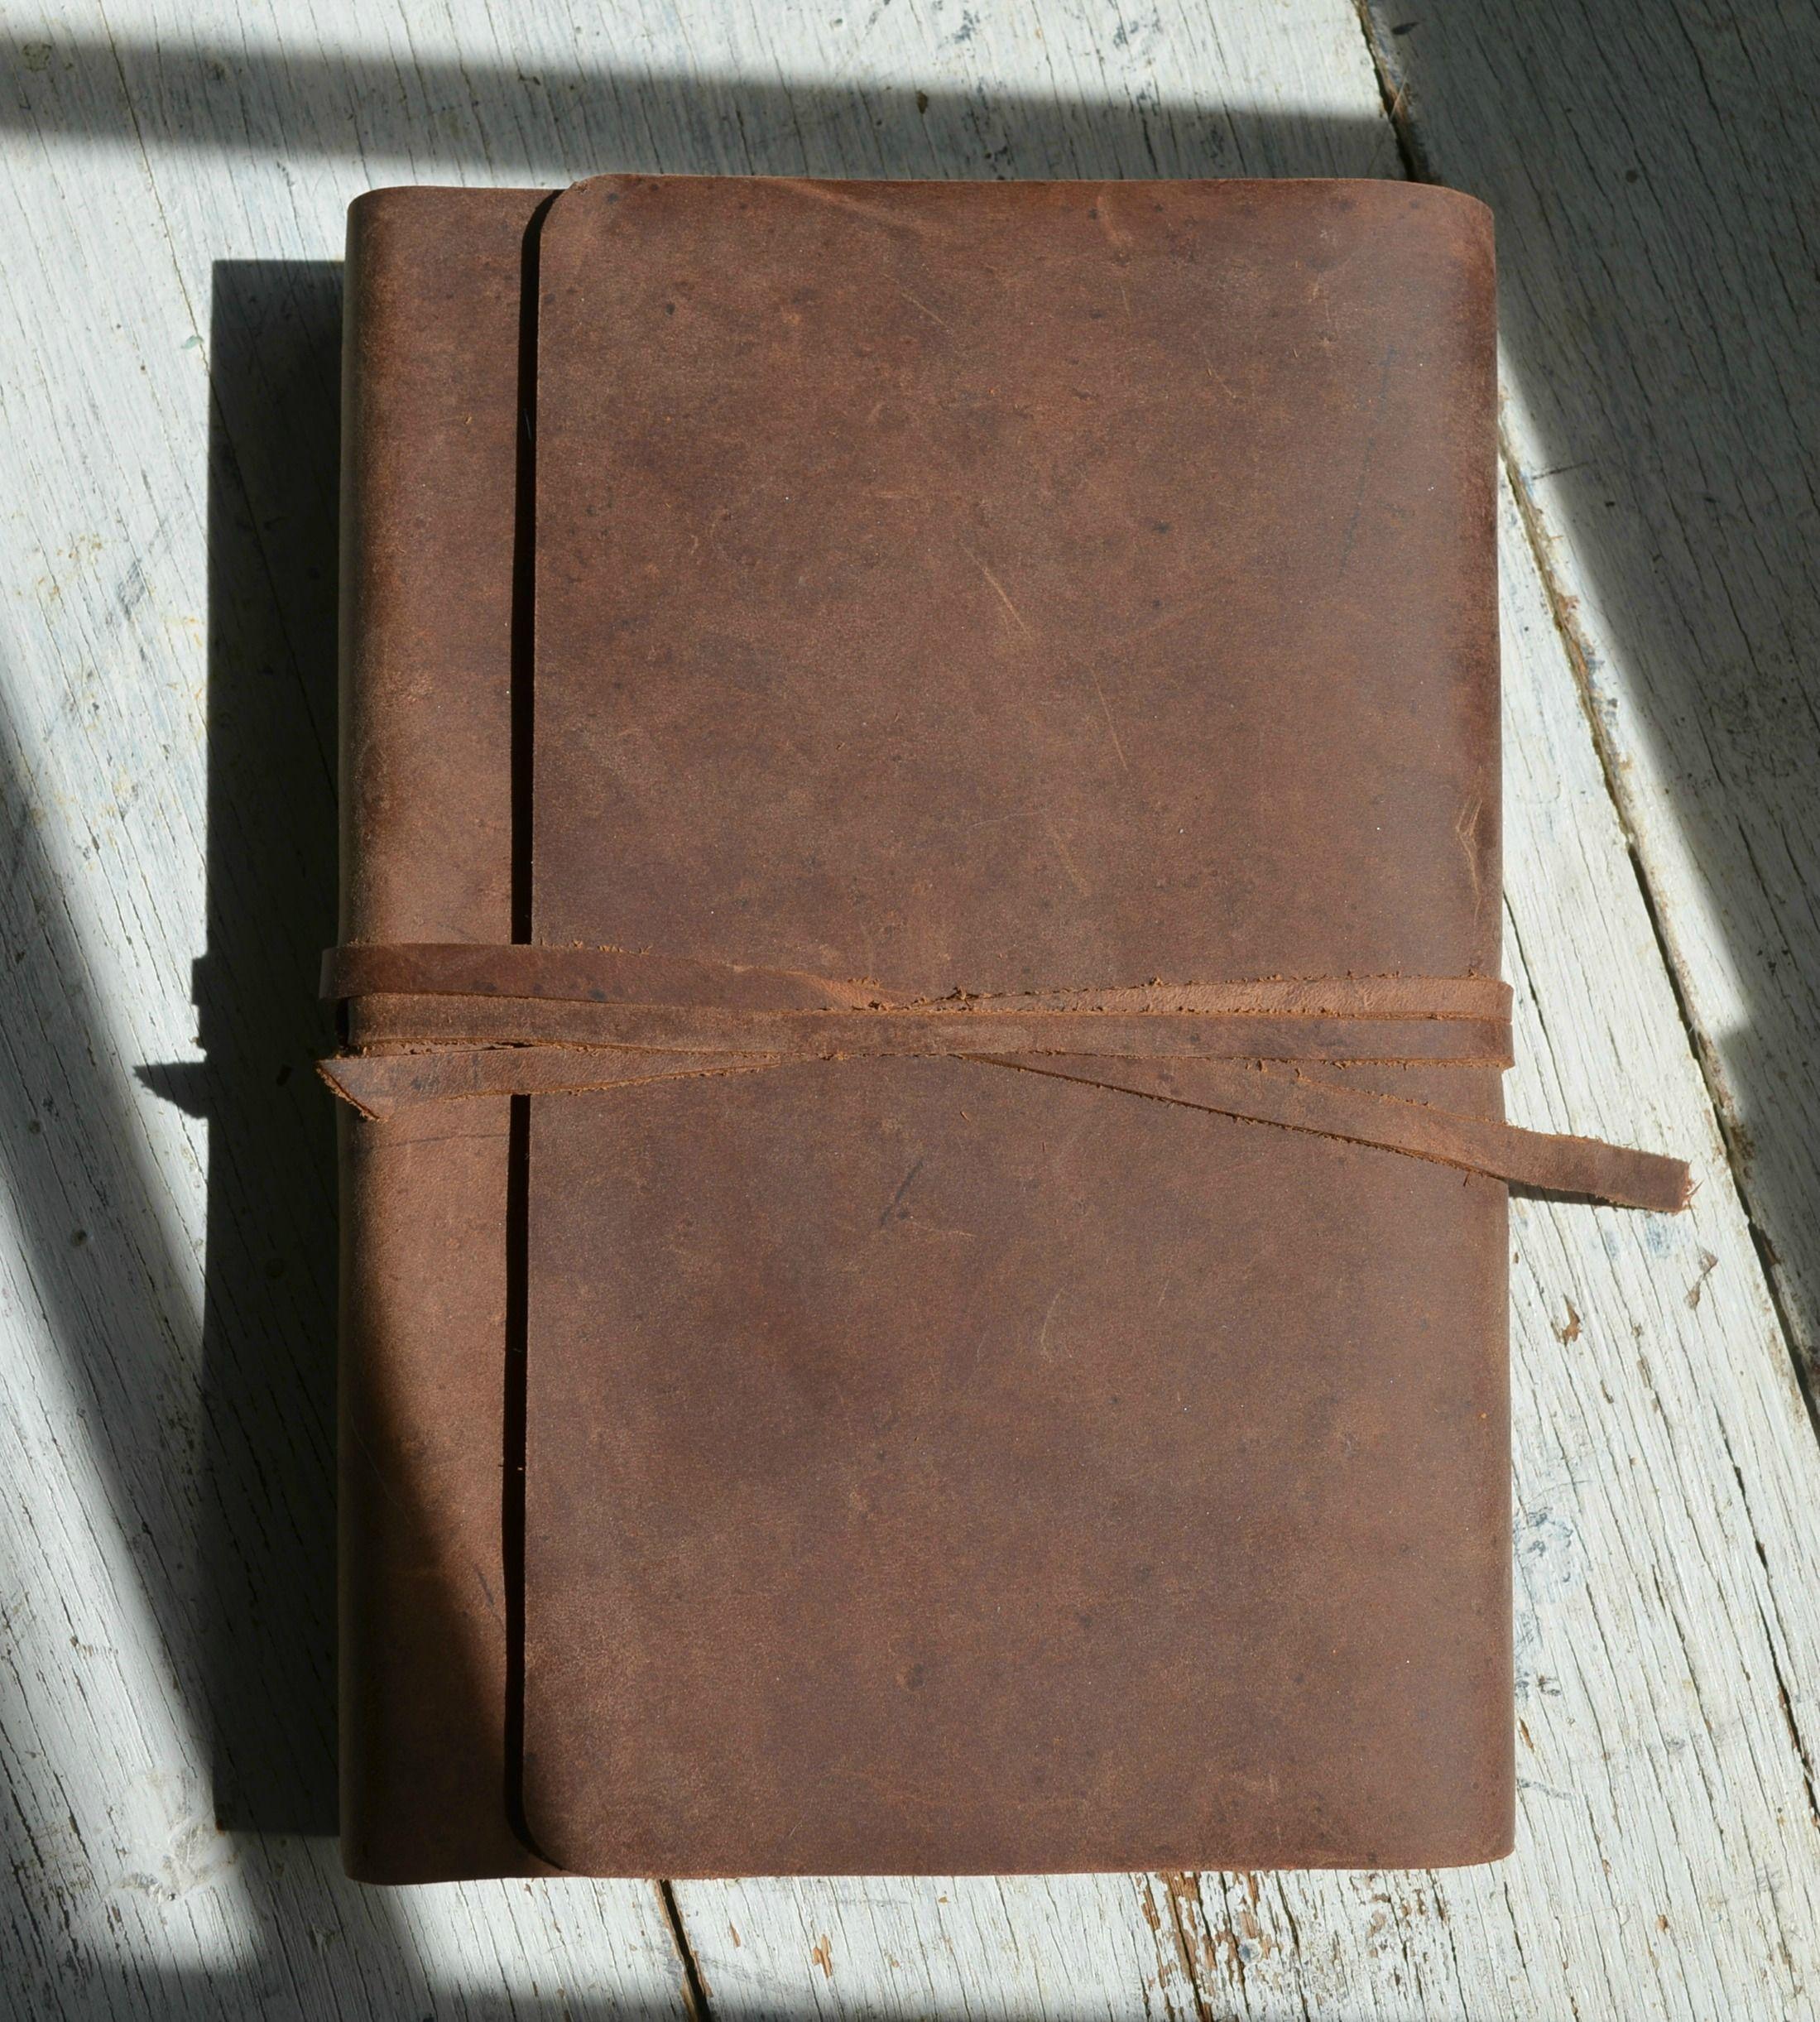 Leather Bound Bible Niv Version Distressed Brown Cowhide 577uu